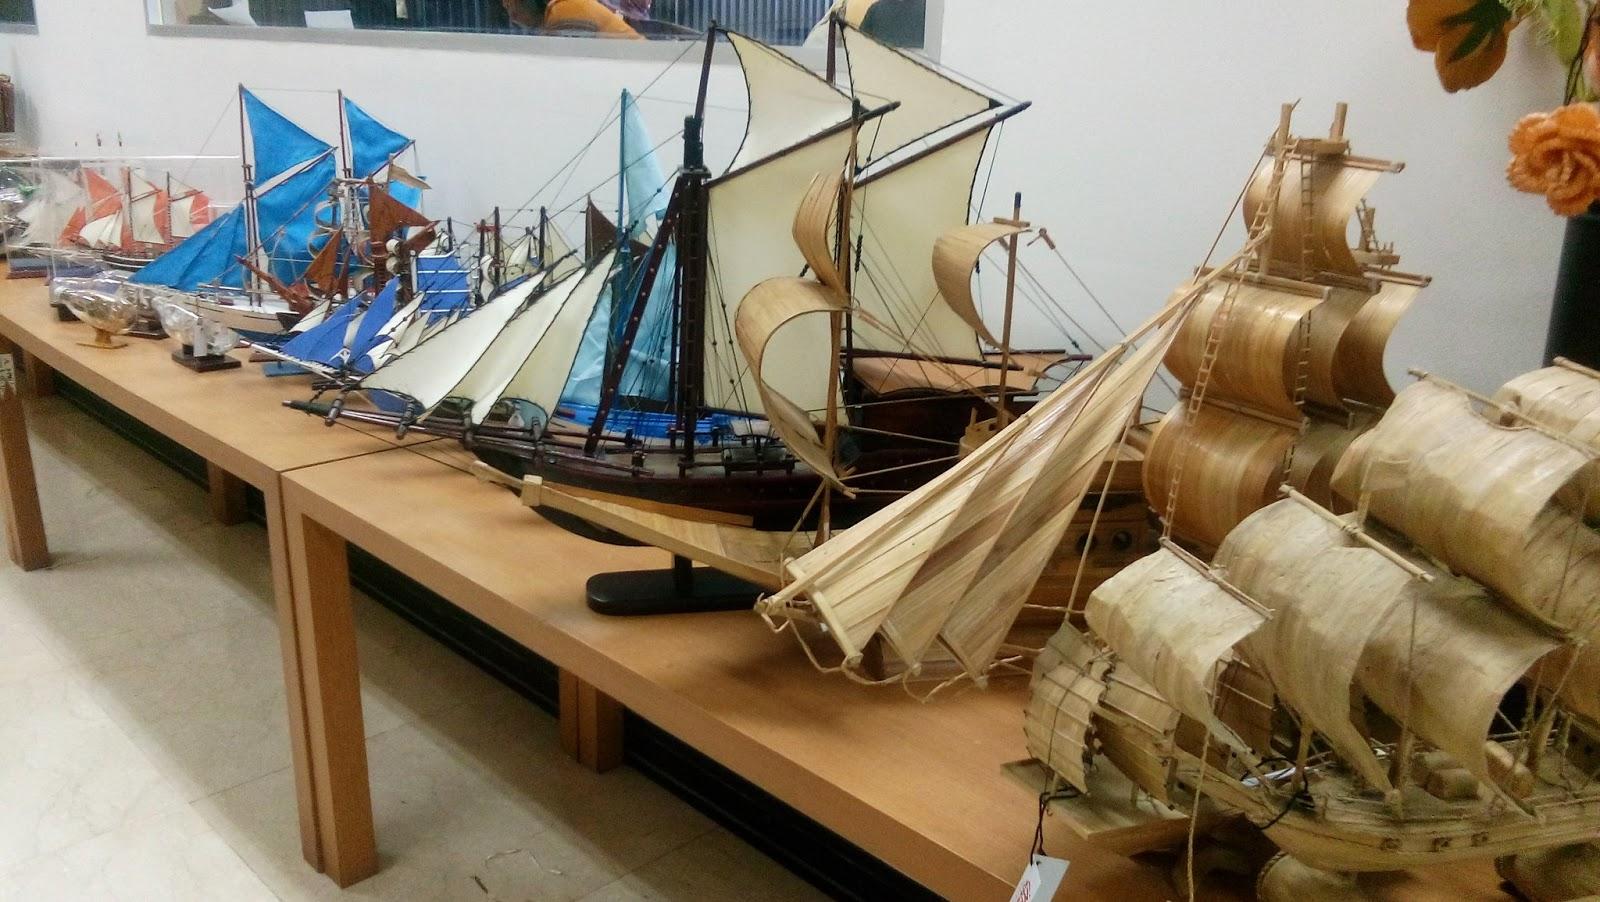 craft berupa kapal pinisi yang ada di ruang kurasi SMESCO